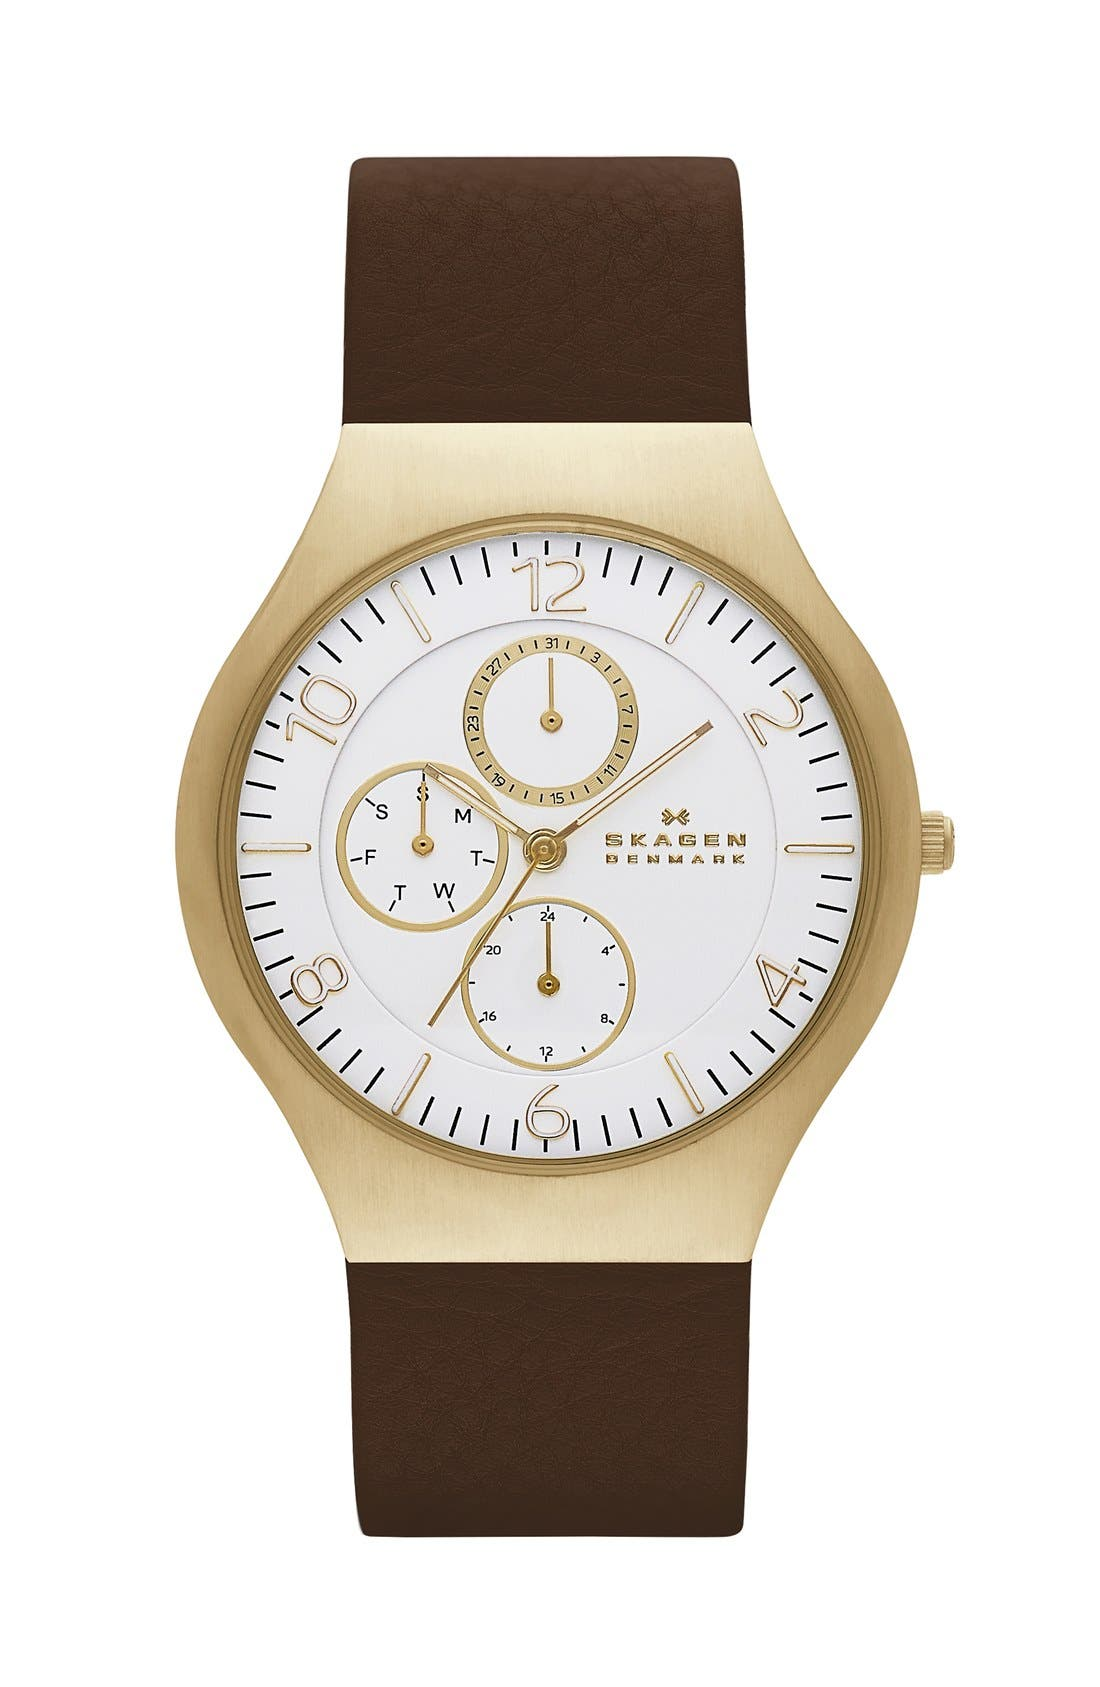 Main Image - Skagen 'Grenen' Multifunction Leather Strap Watch, 41mm